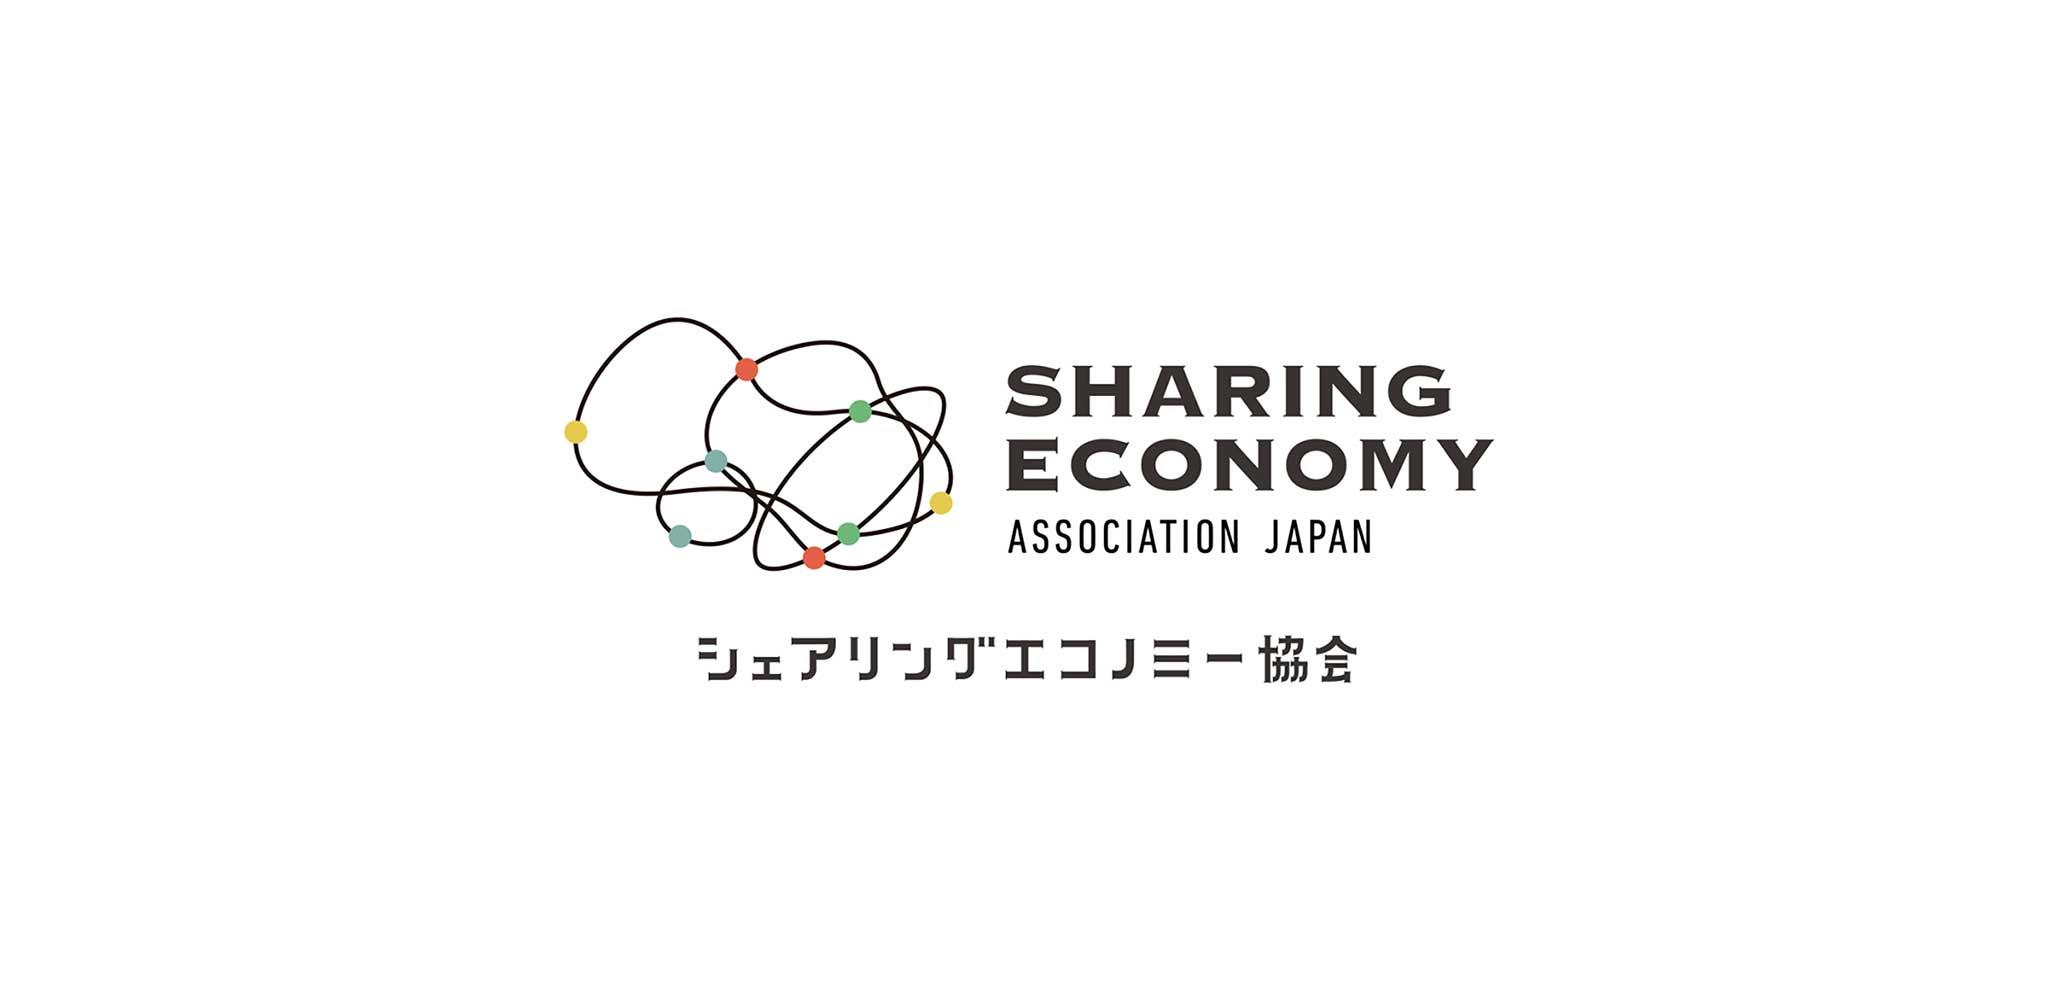 Voice Marche・しぇあ丸・カラツ大学らシェアサービスの運営会社を含む新規9社が加入